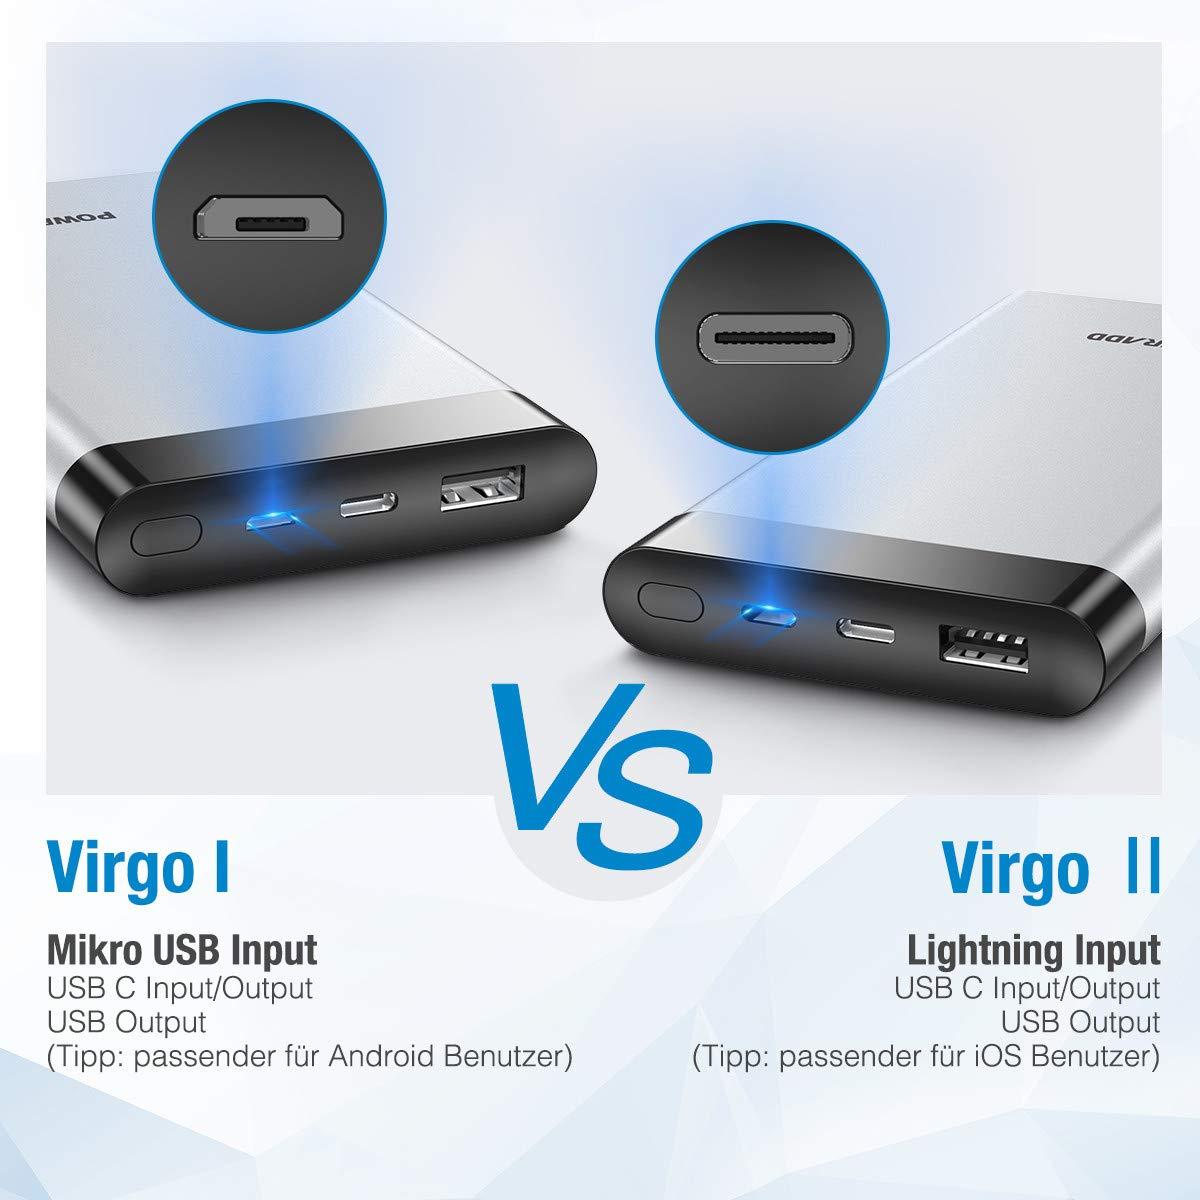 Poweradd VirgoⅡ Powerbank 10000mAh, Externer Akku mit LED Digitalanzeige , 1 USB C ( Input / Output ) Port , 1 Lightning Input und 1 USB Output , superschnelles Laden für iPhone X / 8 / 7 / 6s , Huawei mate 9 , mate 10 , P9 , P10 , P20 , Sa